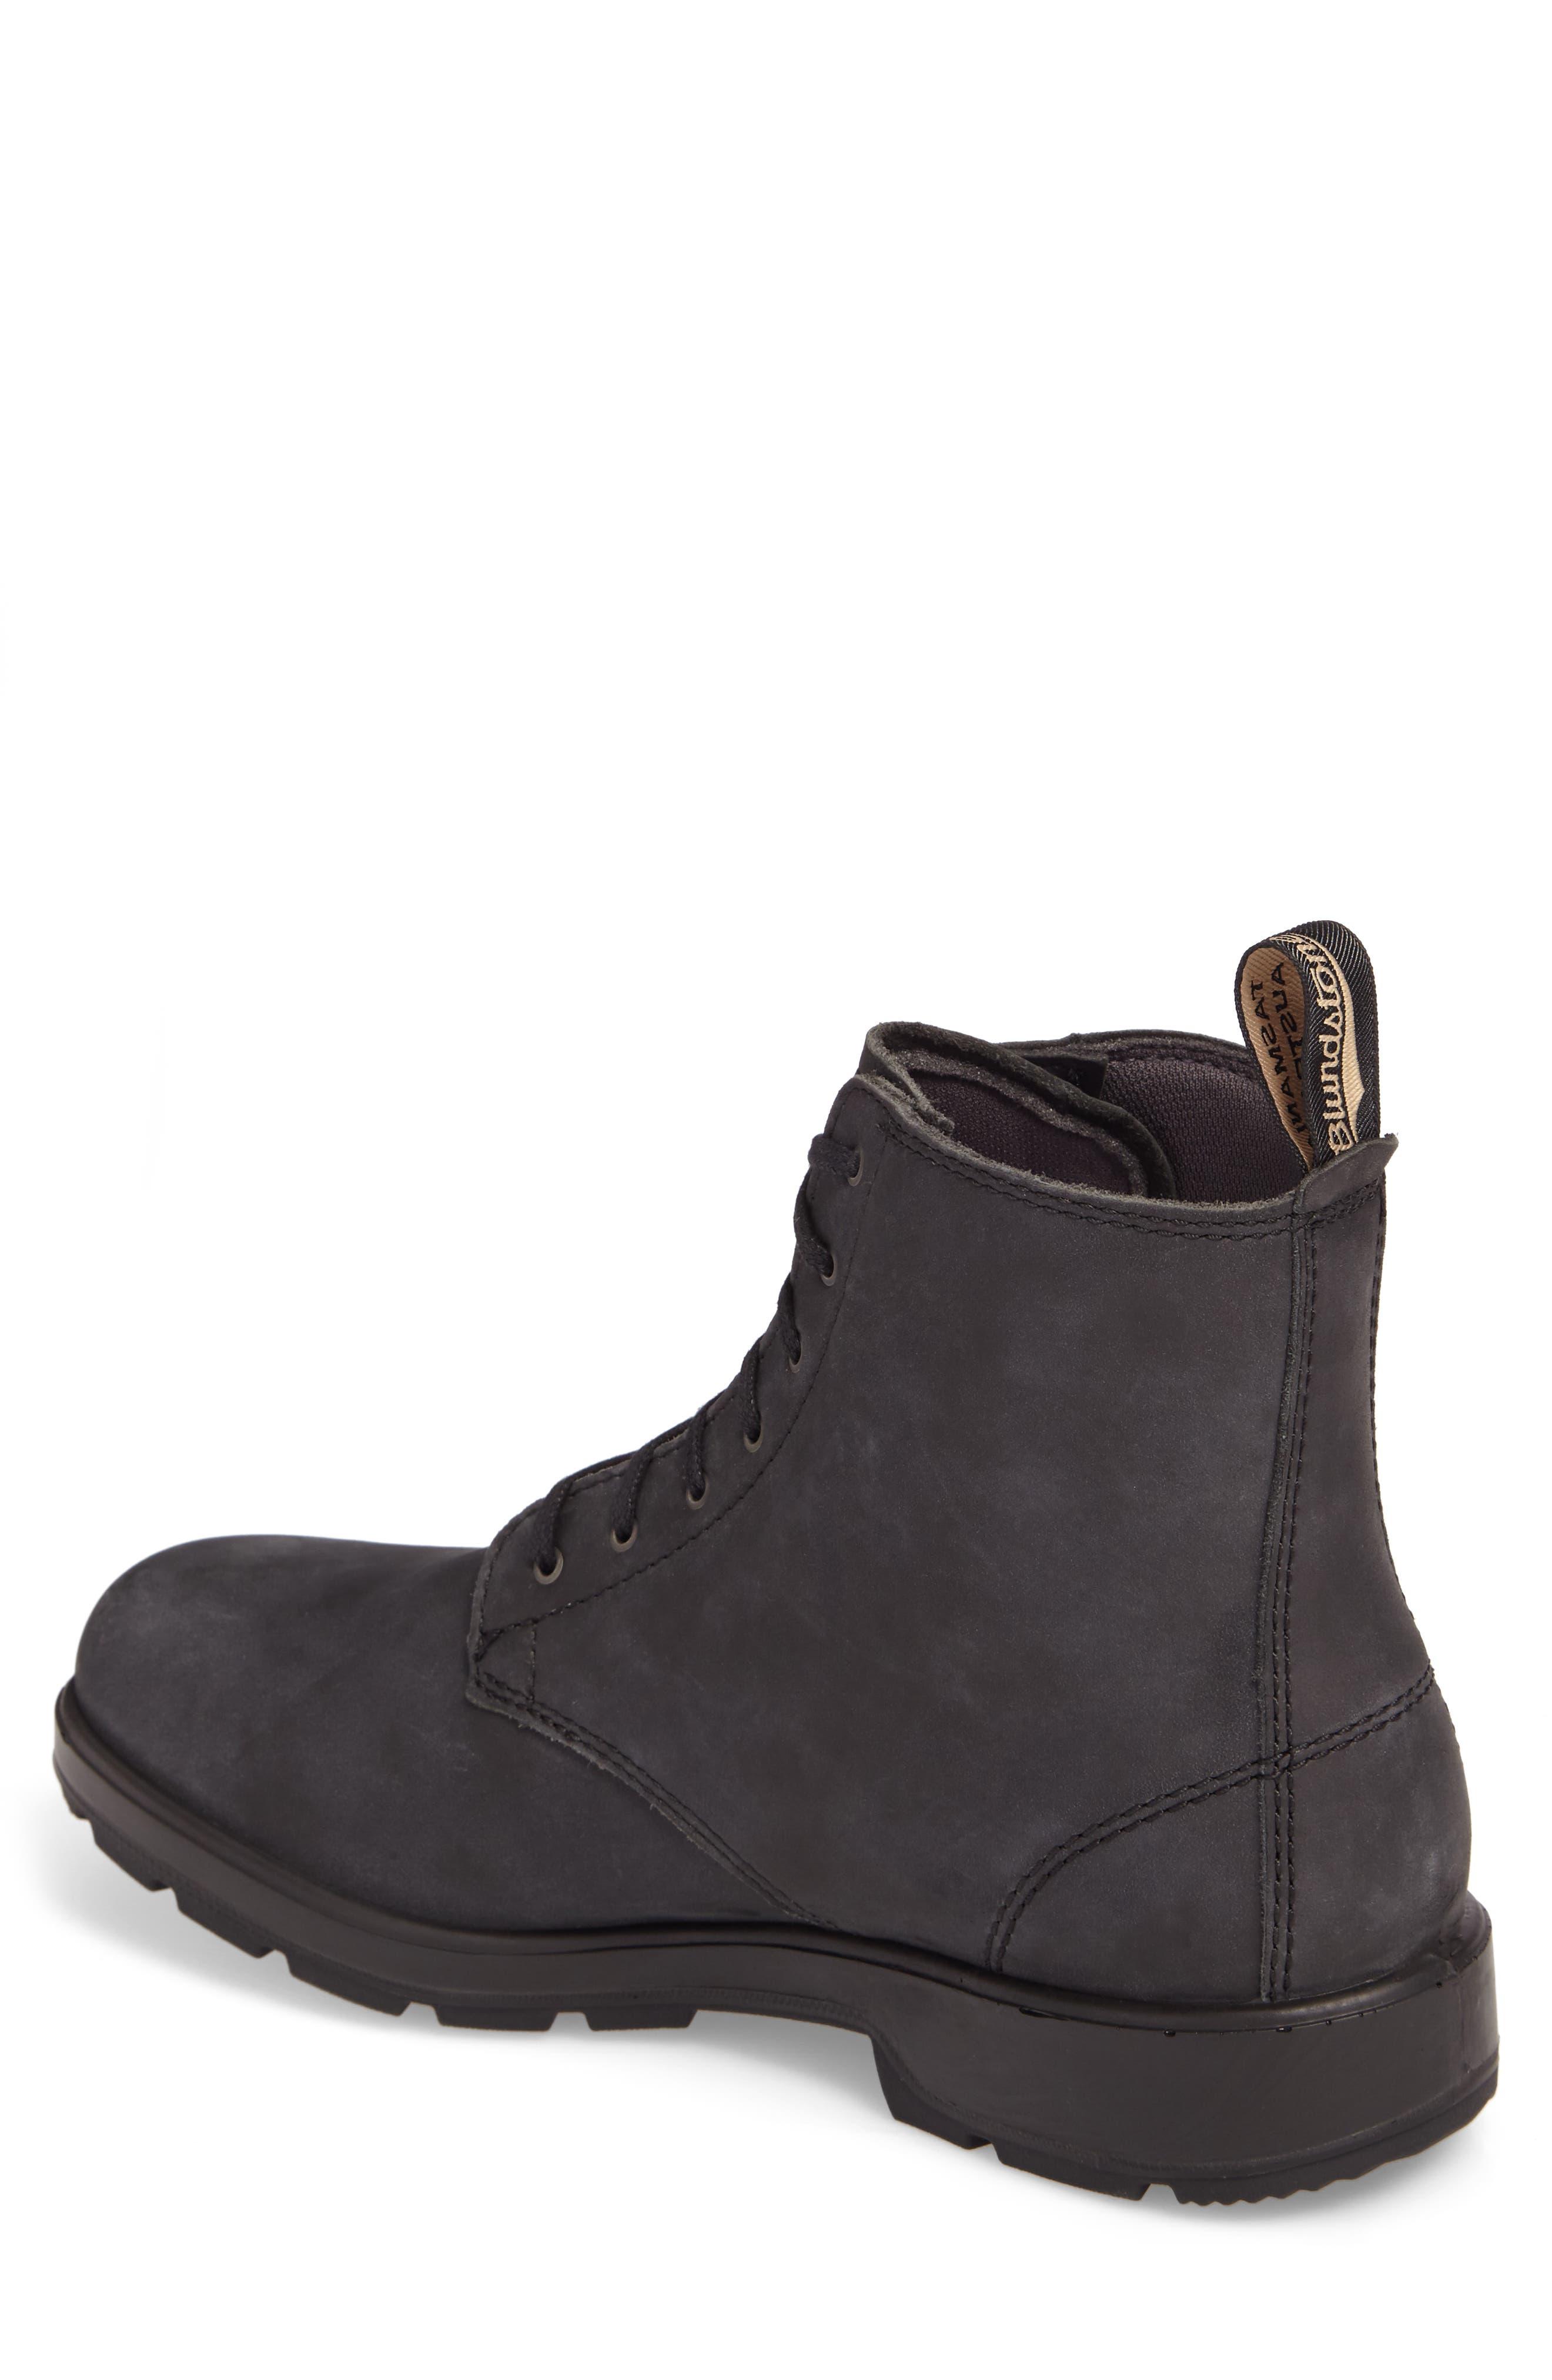 Original Plain Toe Boot,                             Alternate thumbnail 2, color,                             001